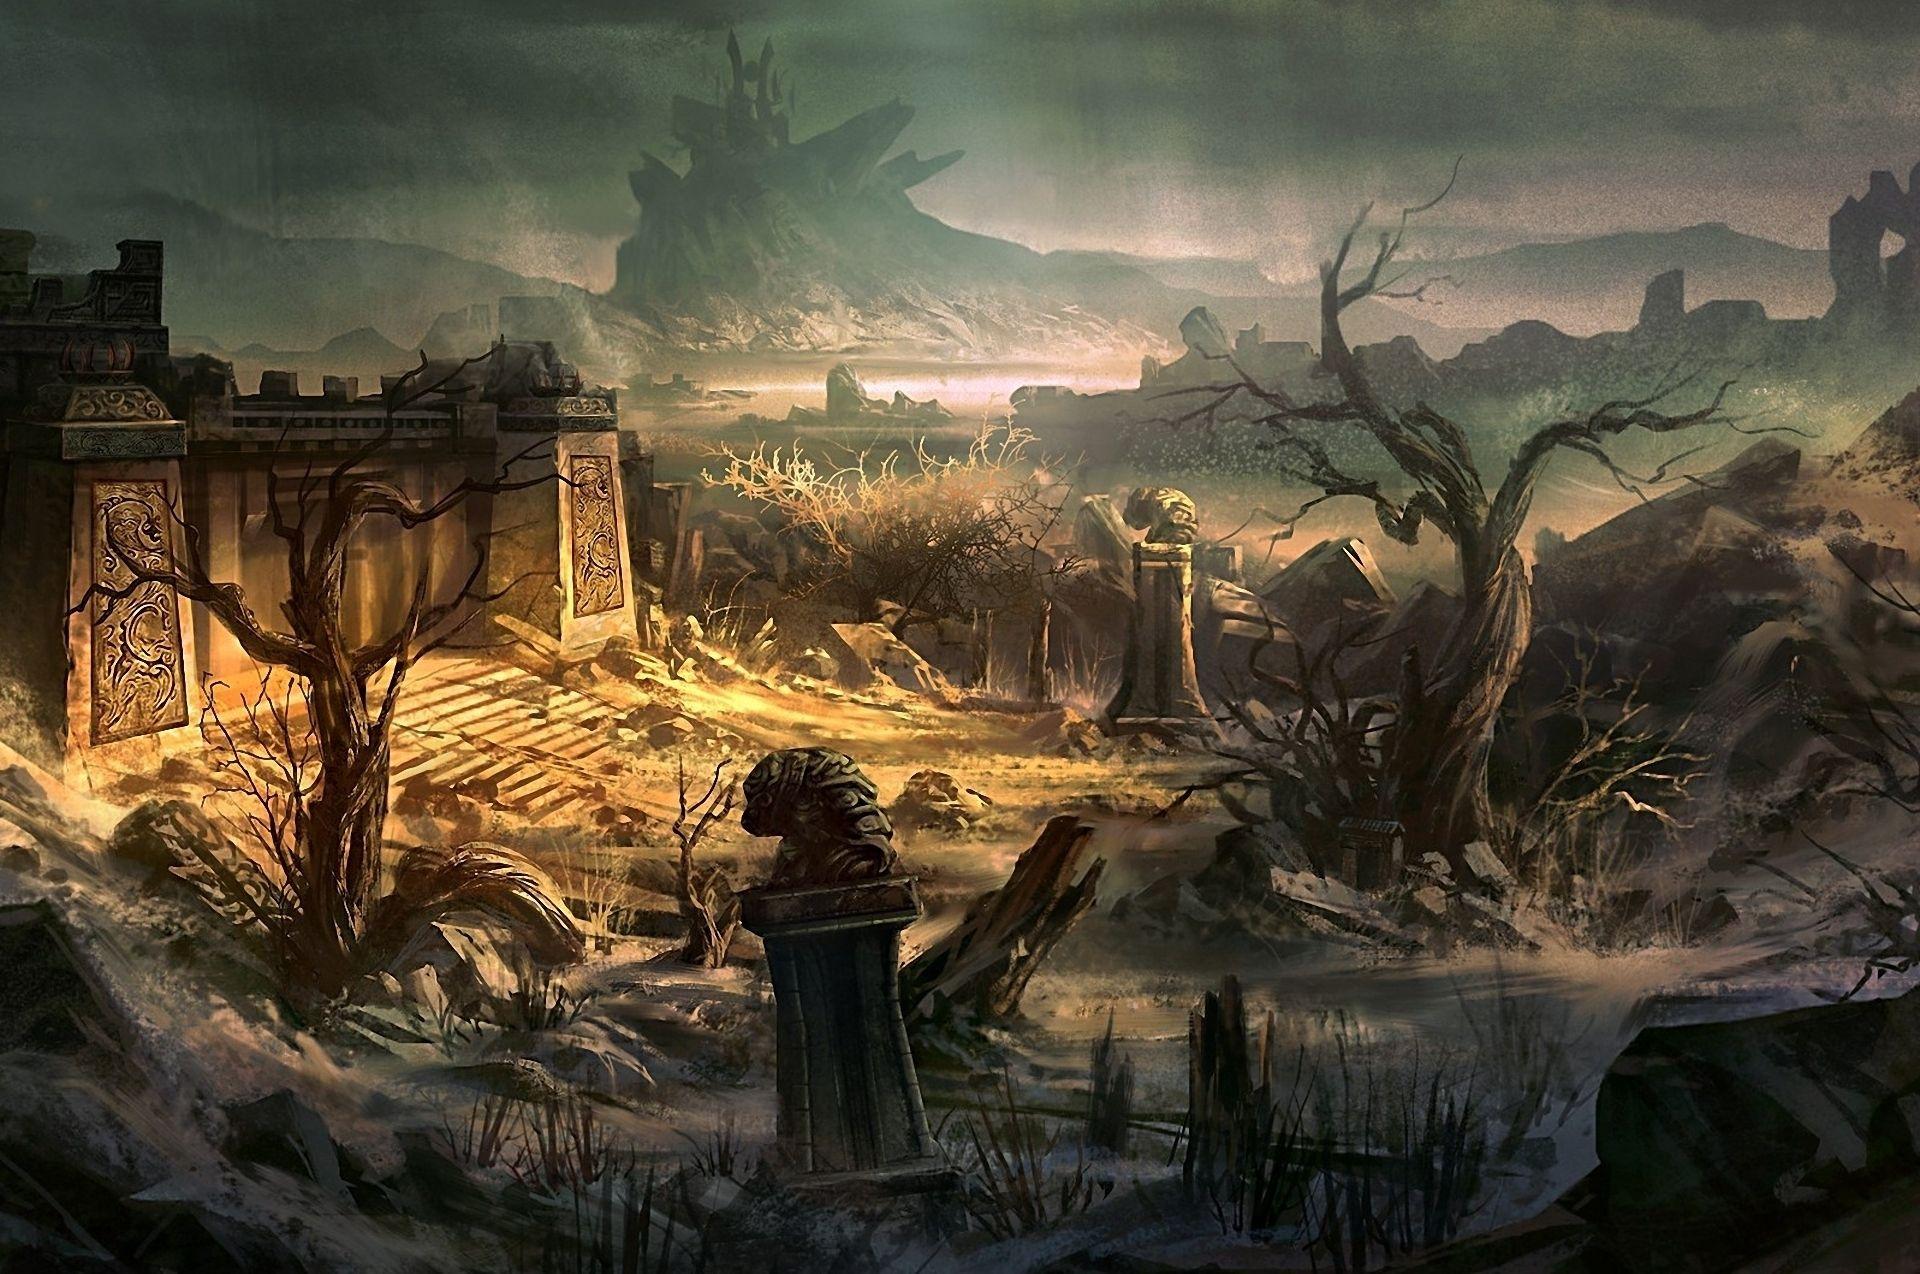 landscapes castles fantasy art - photo #47